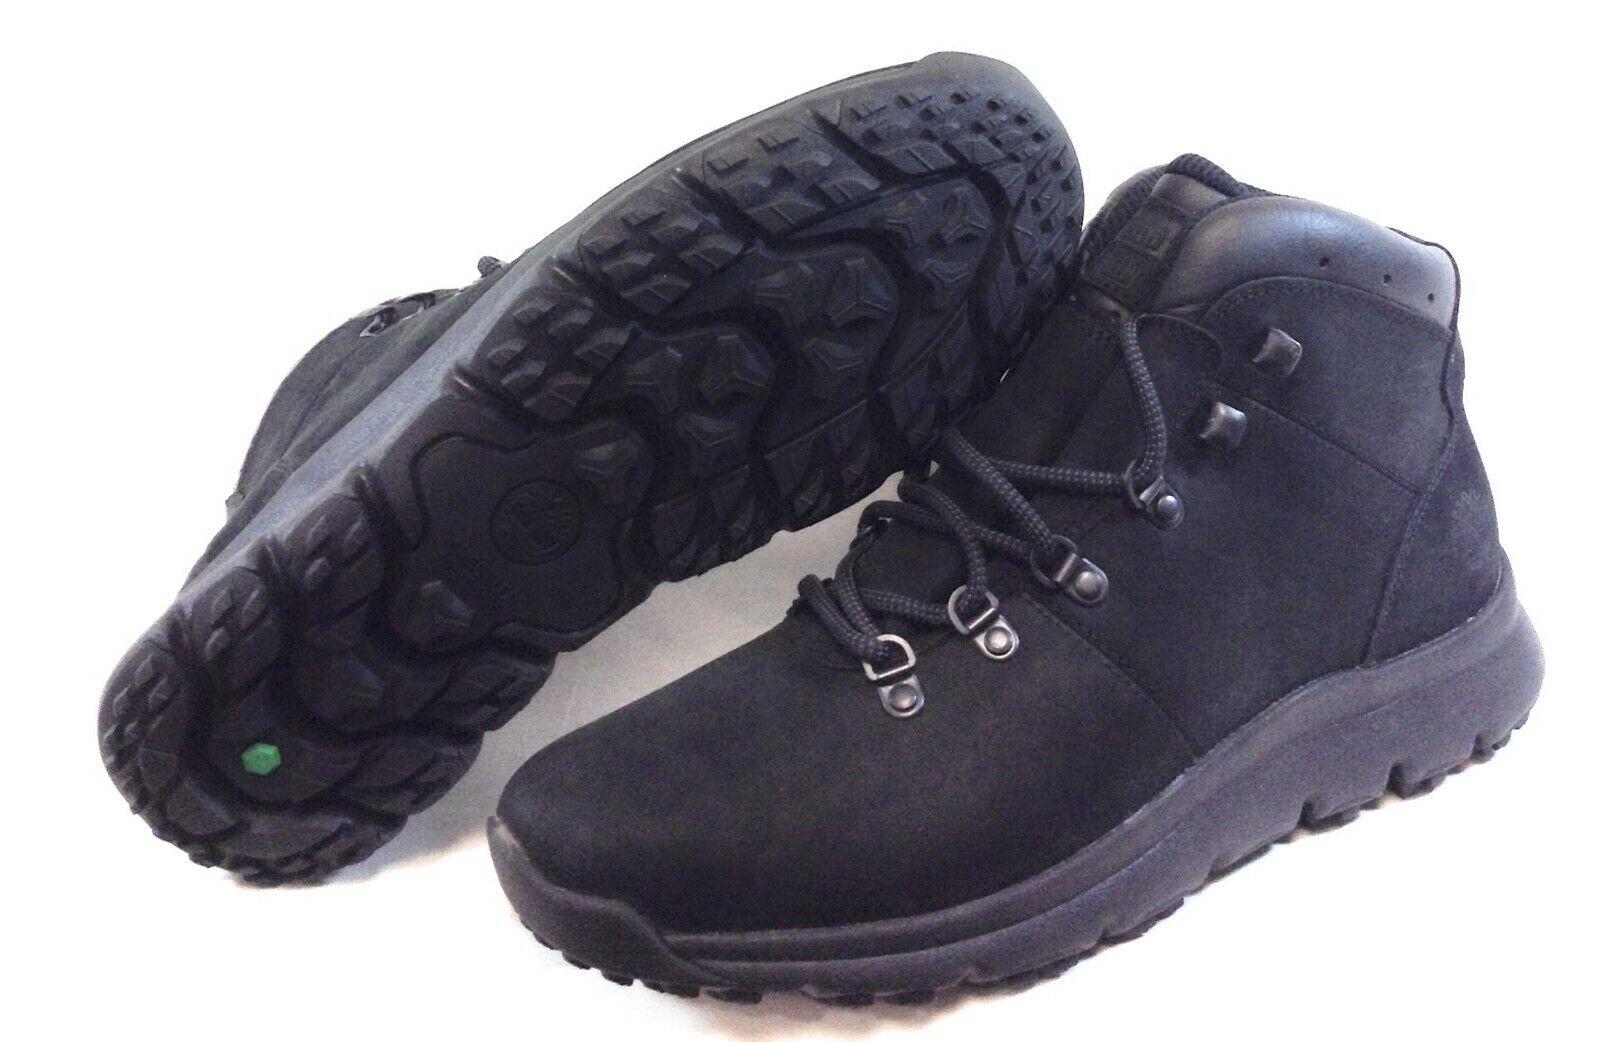 New Timberland MENS World Hiker Black Boot A1WND Size 7.5